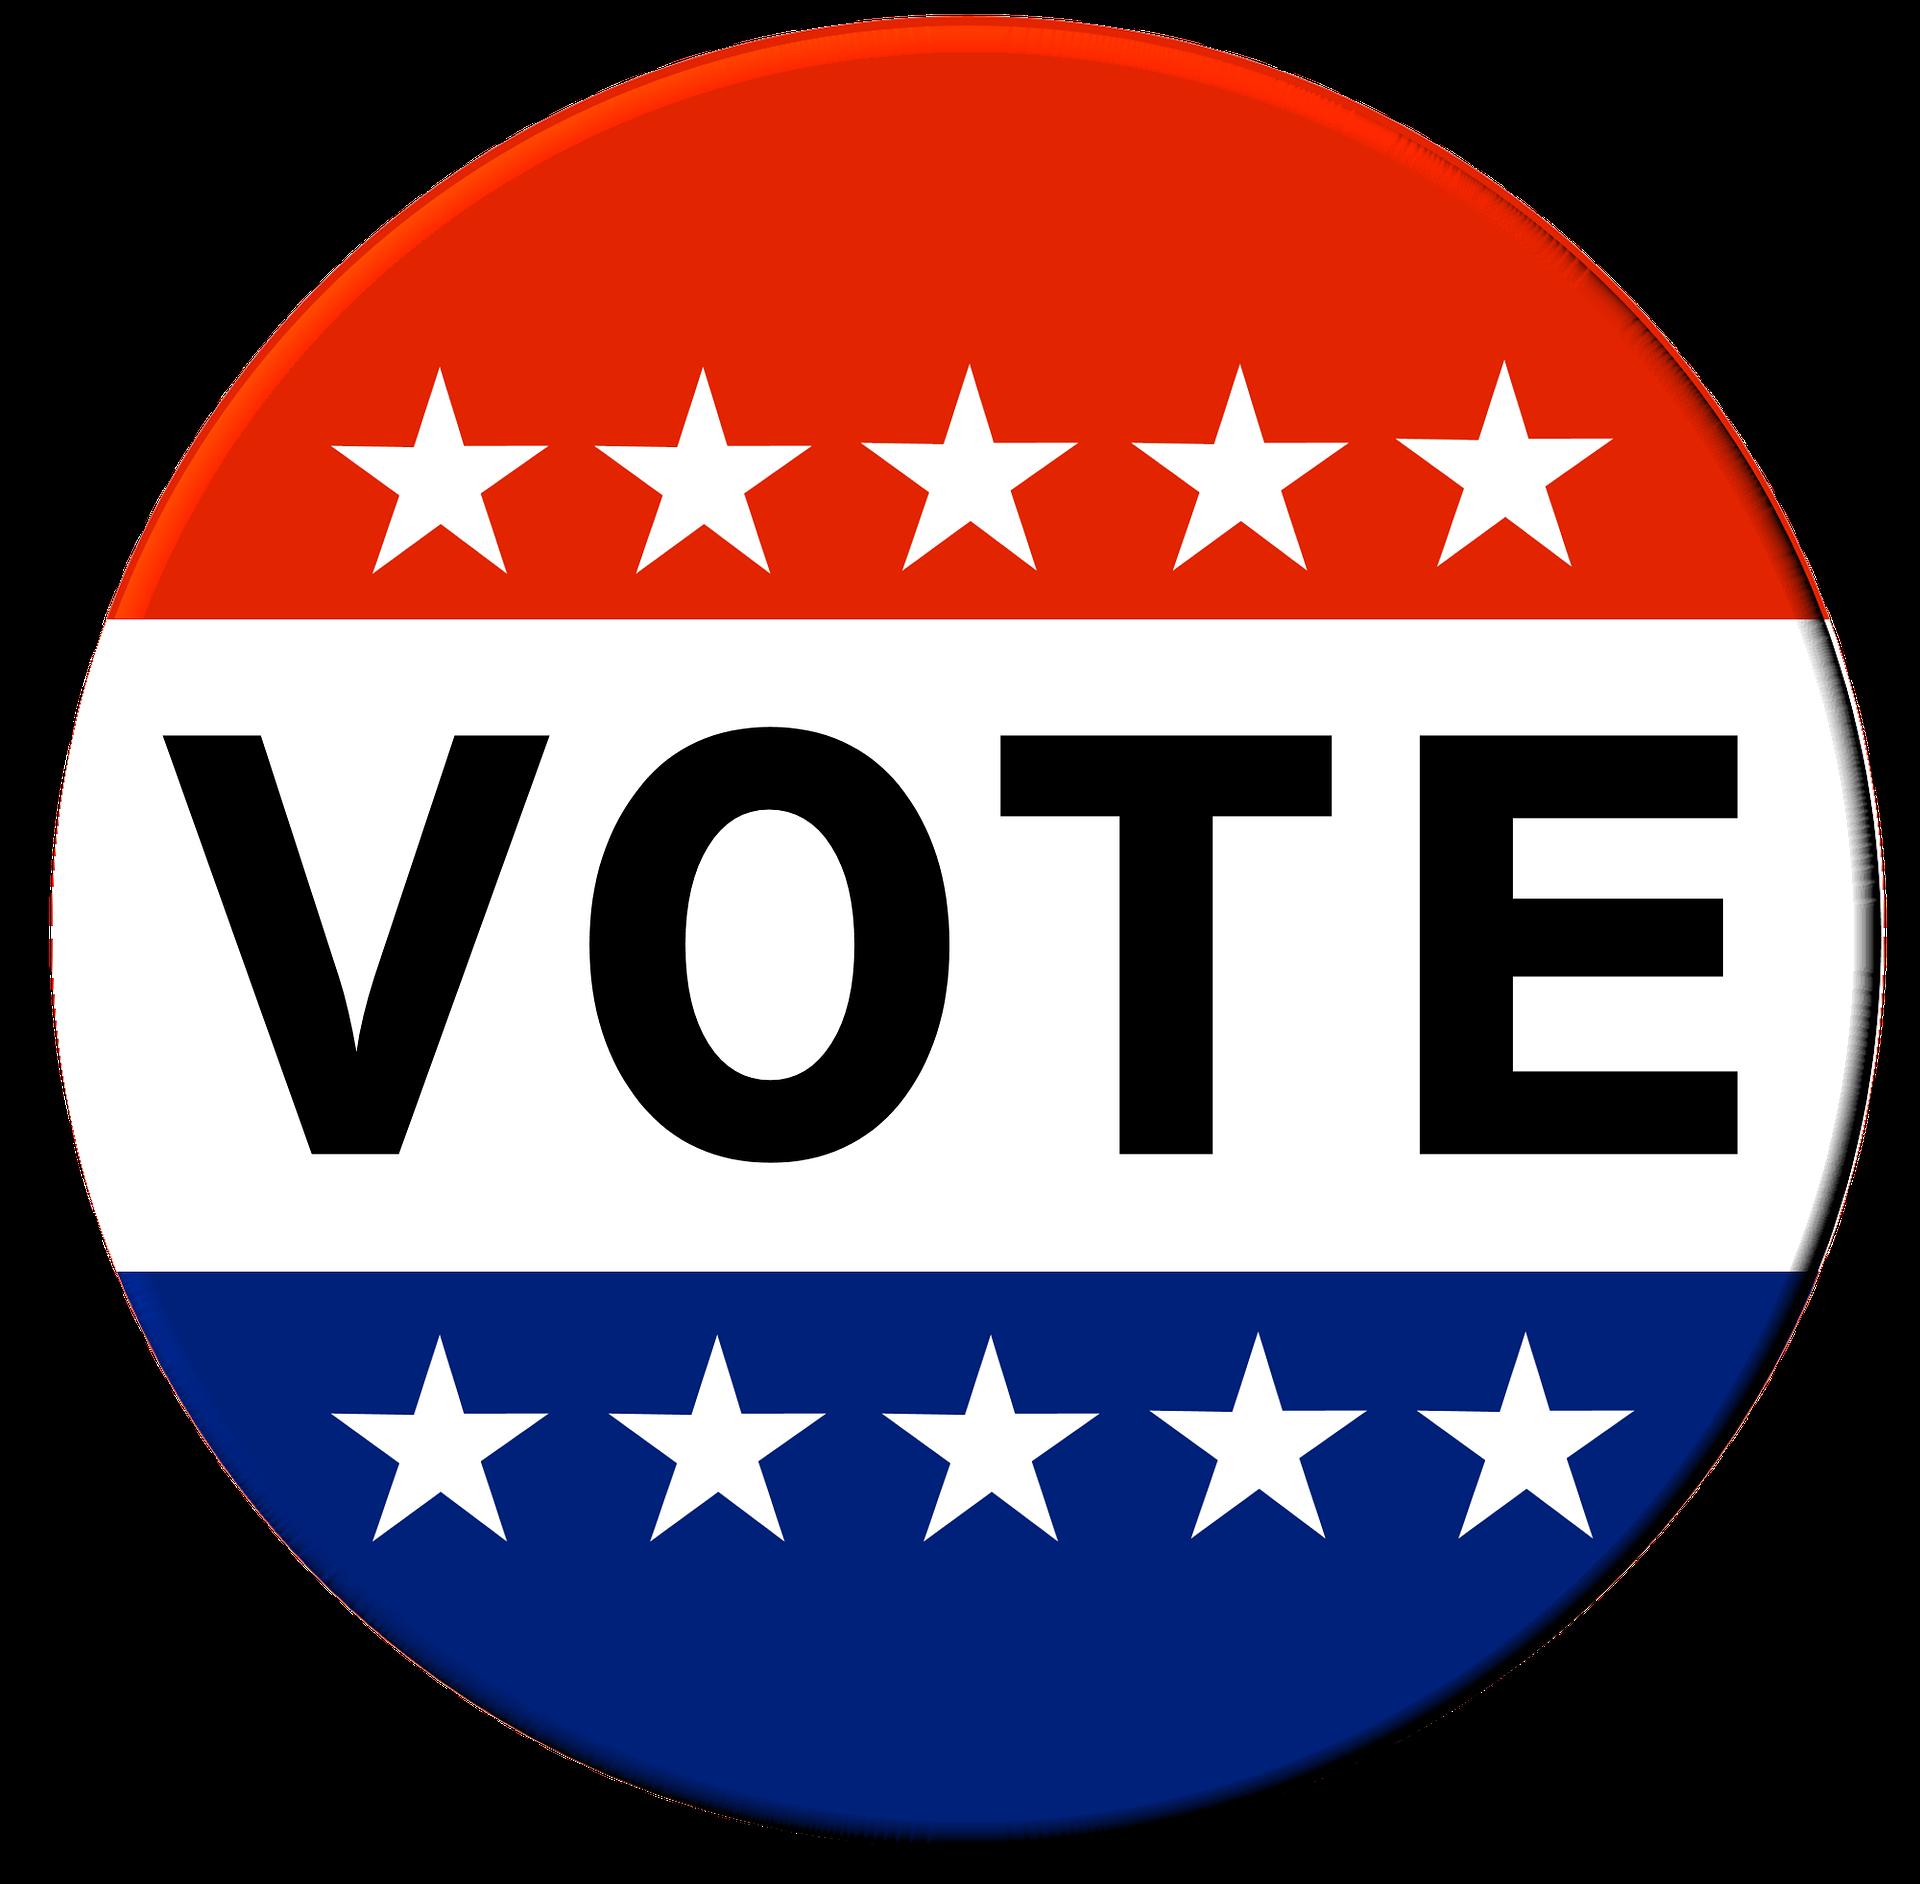 5ad4f20b-ca2d-11ea-a3d0-06b4694bee2a%2F1603465511316-Vote.png